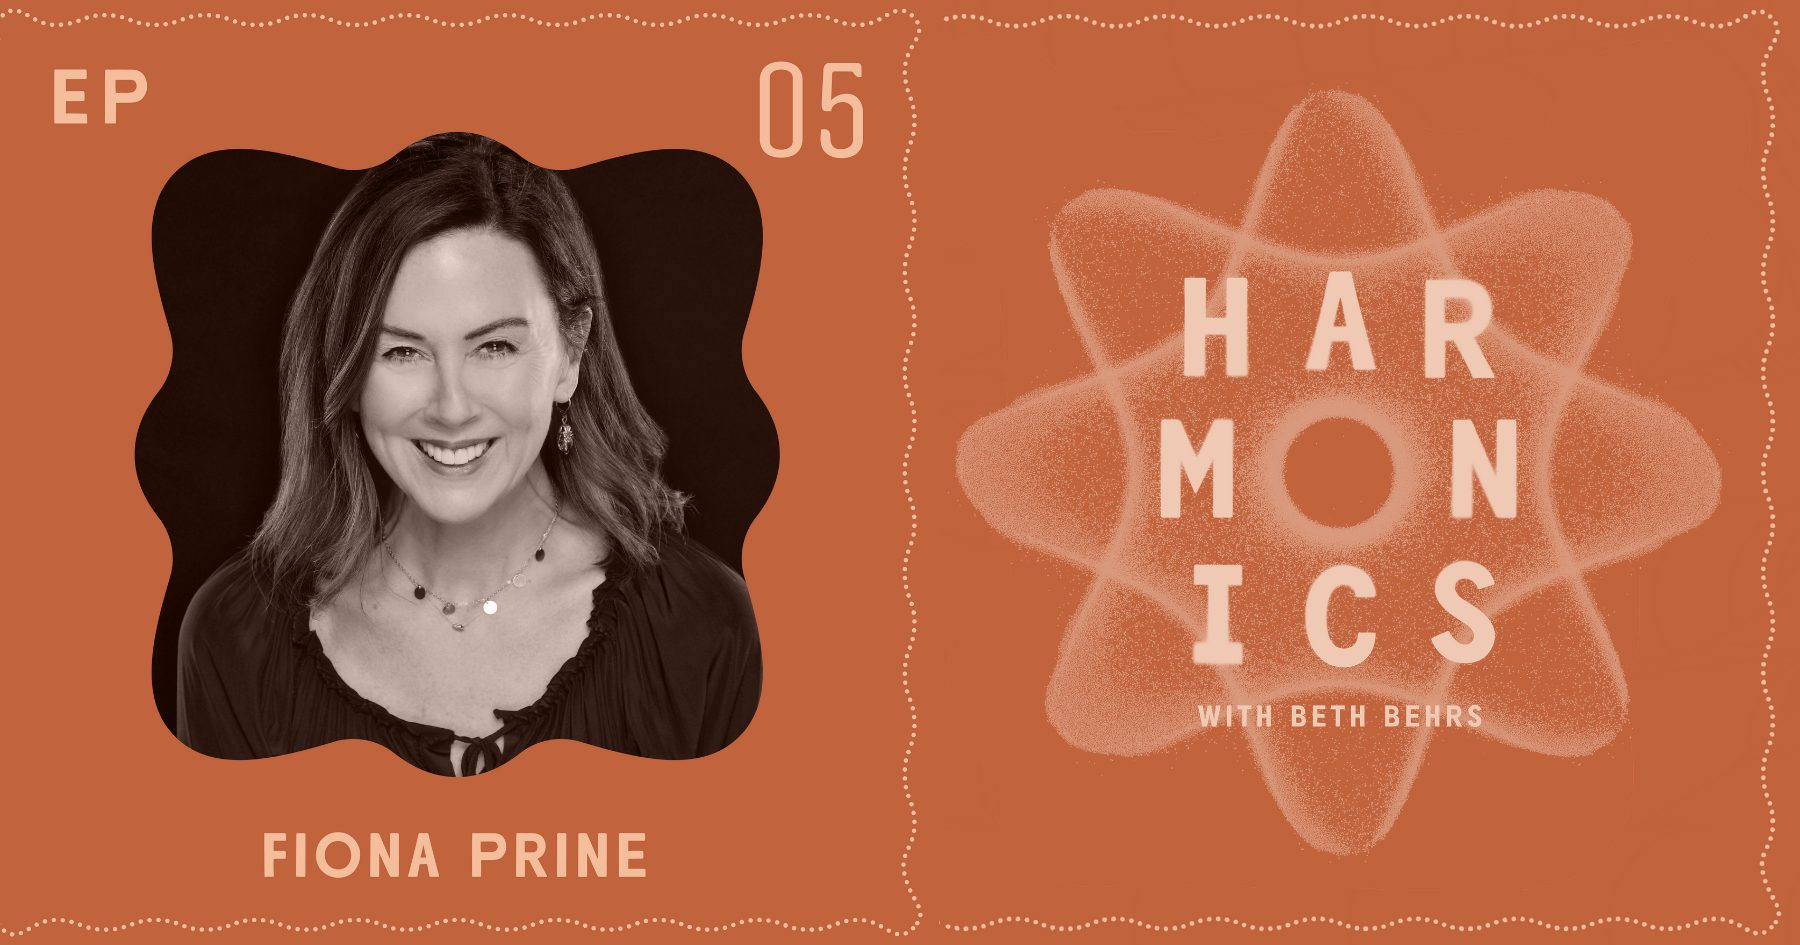 Harmonics with Beth Behrs: Fiona Prine